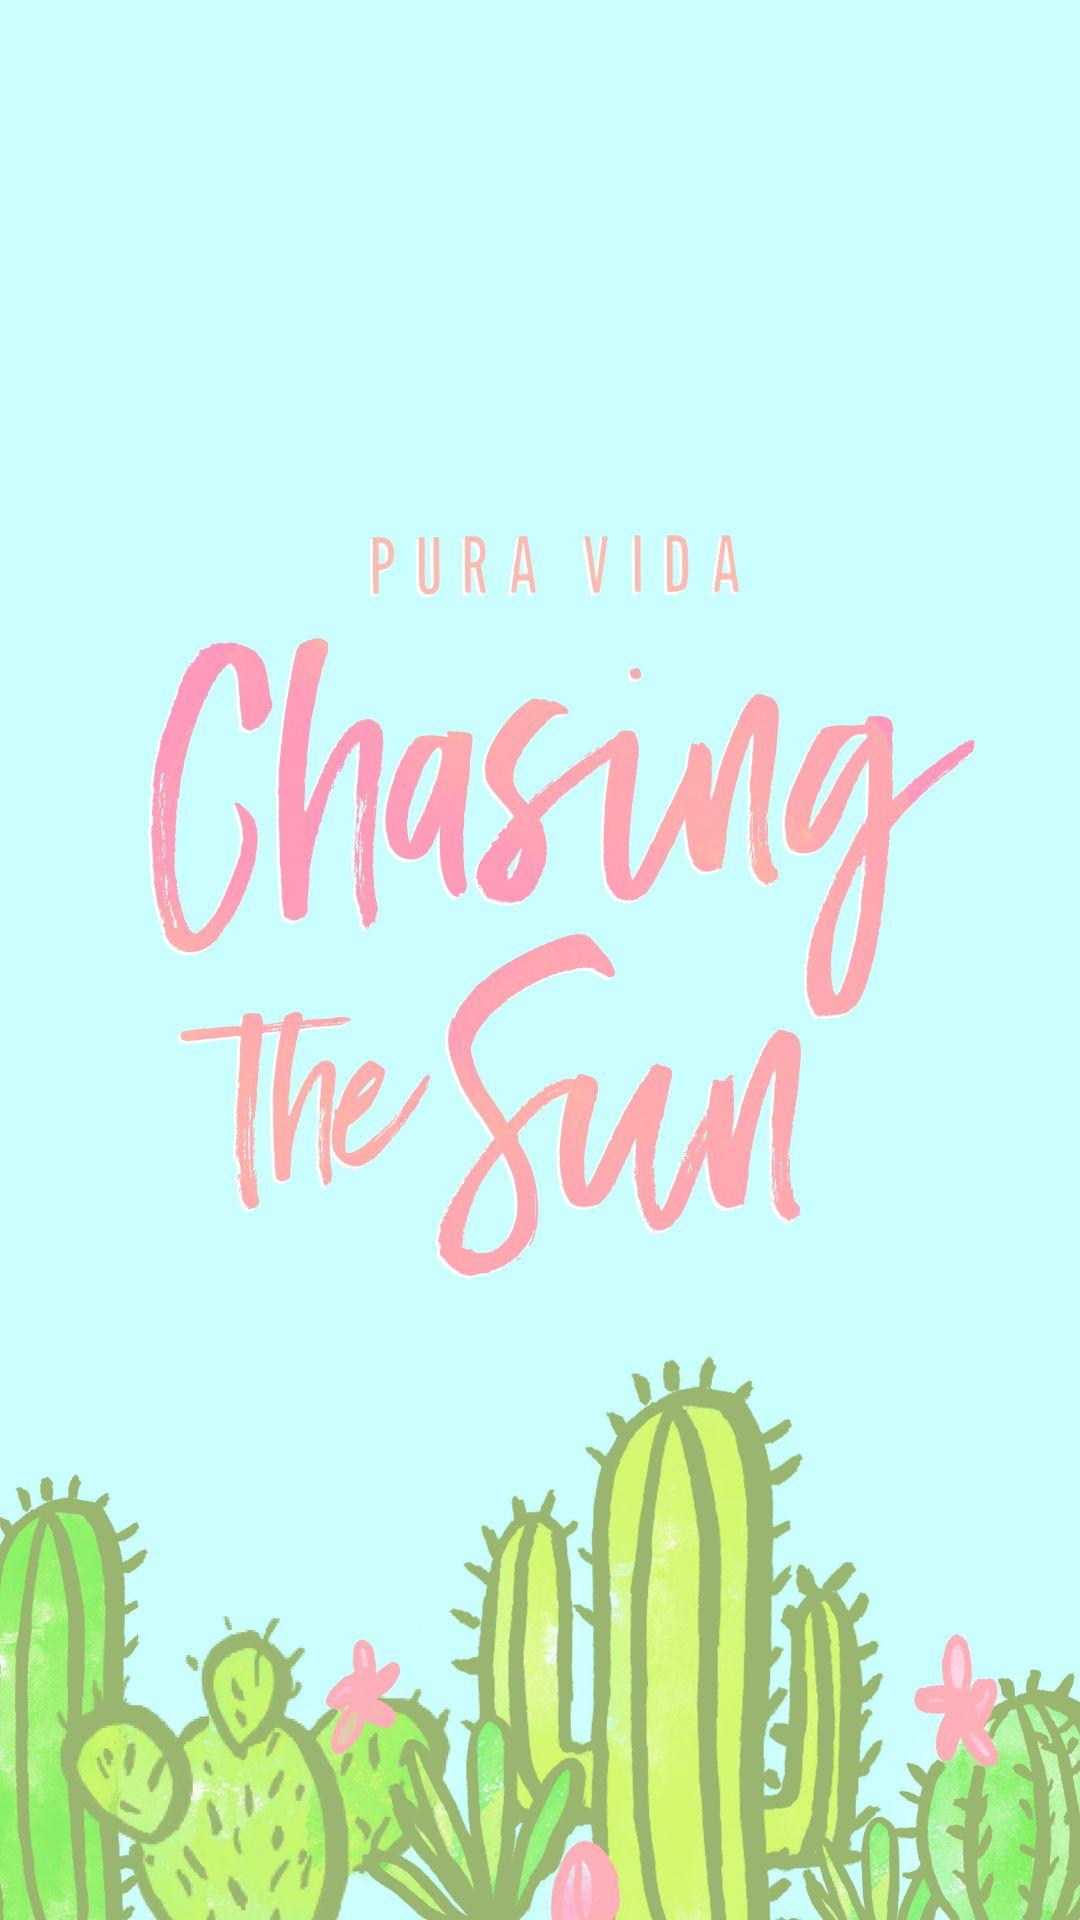 pura vida wallpaper  The Pura Vida Bracelets Blog - Sundaze Digi Downloads | iPhone ...